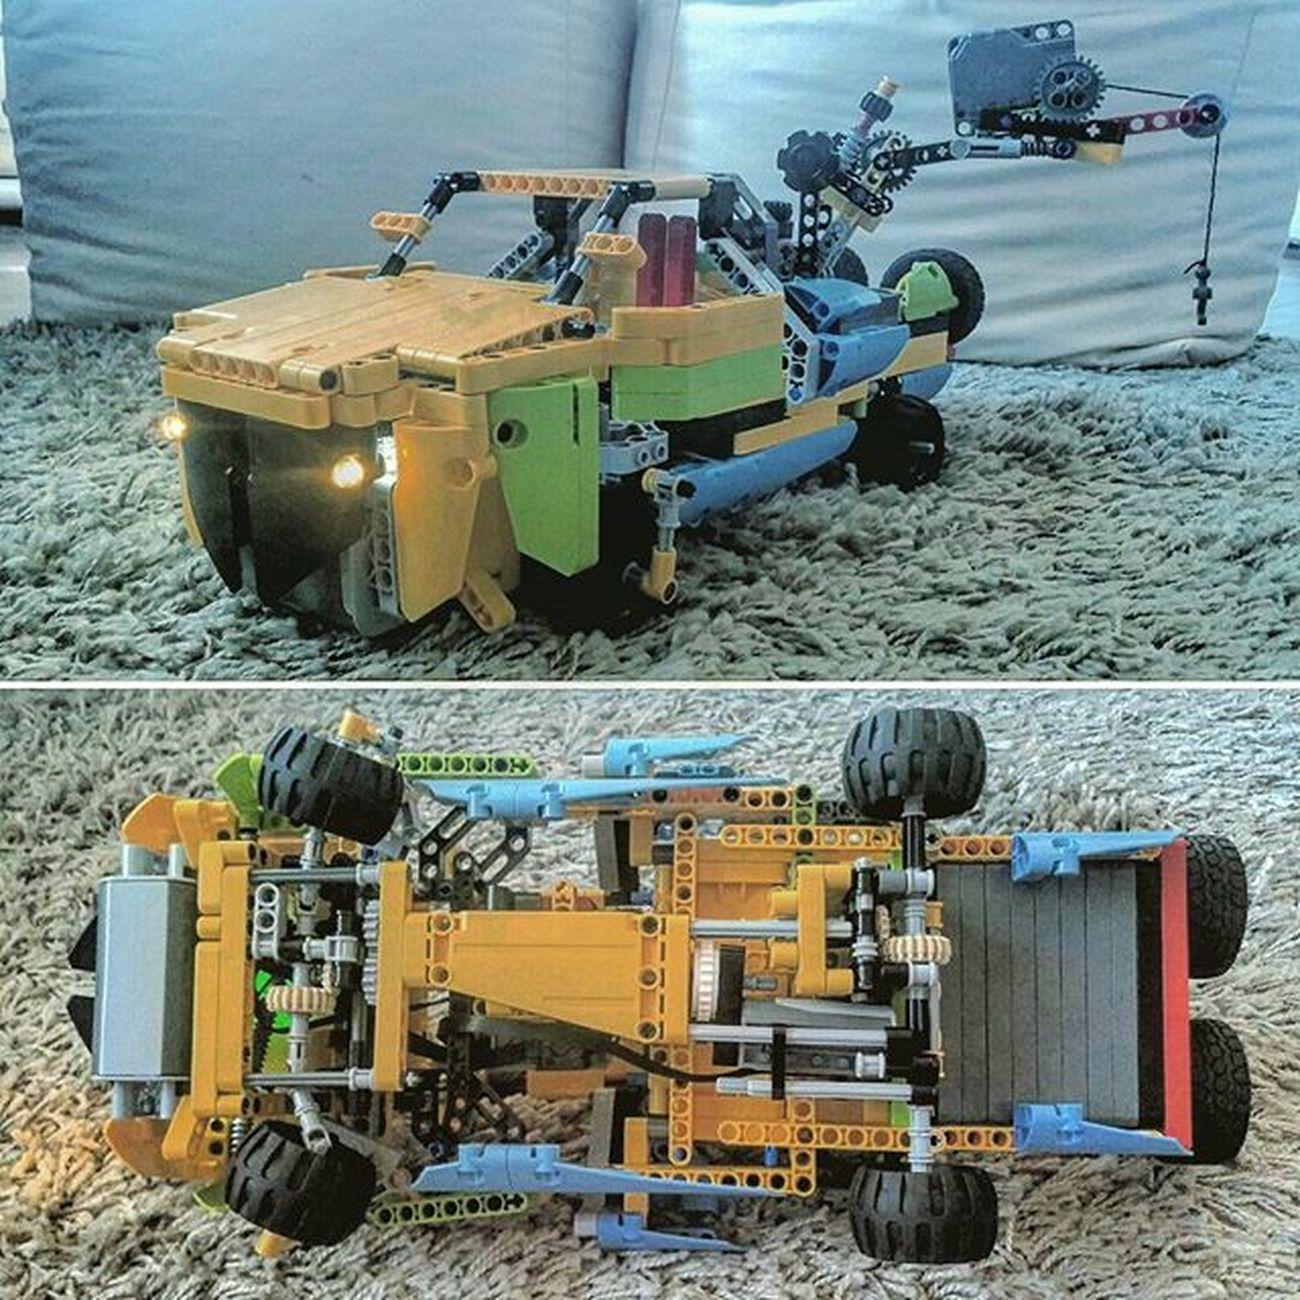 9volt 4x4 SUV LegoTechnic Custom Netto16ora :D